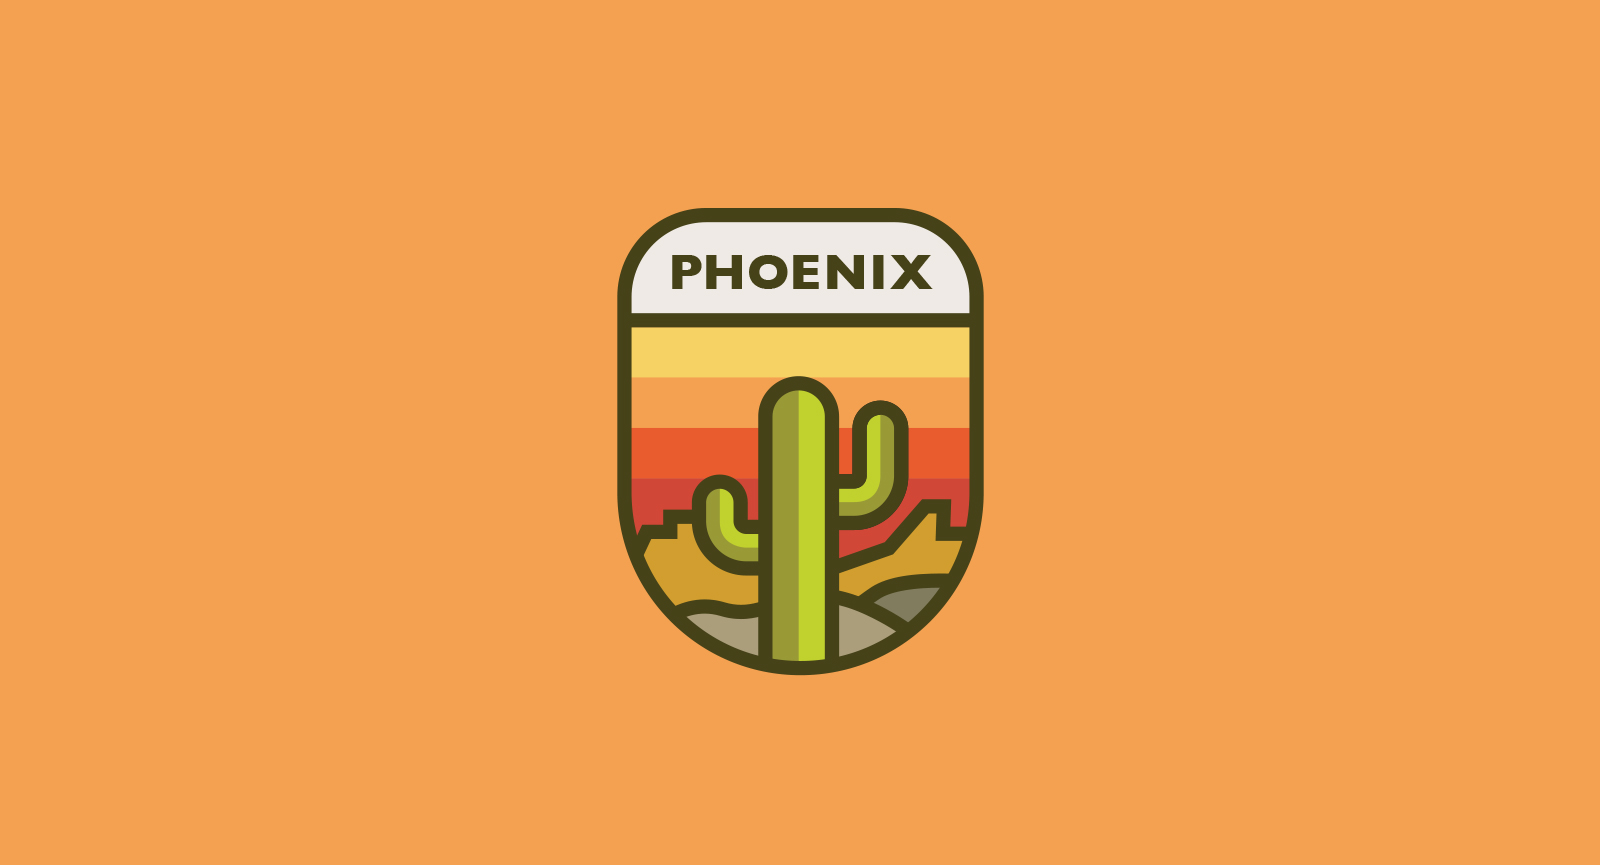 Cactus illustration Phoenix Snapchat Geofilter by Josh Namdar